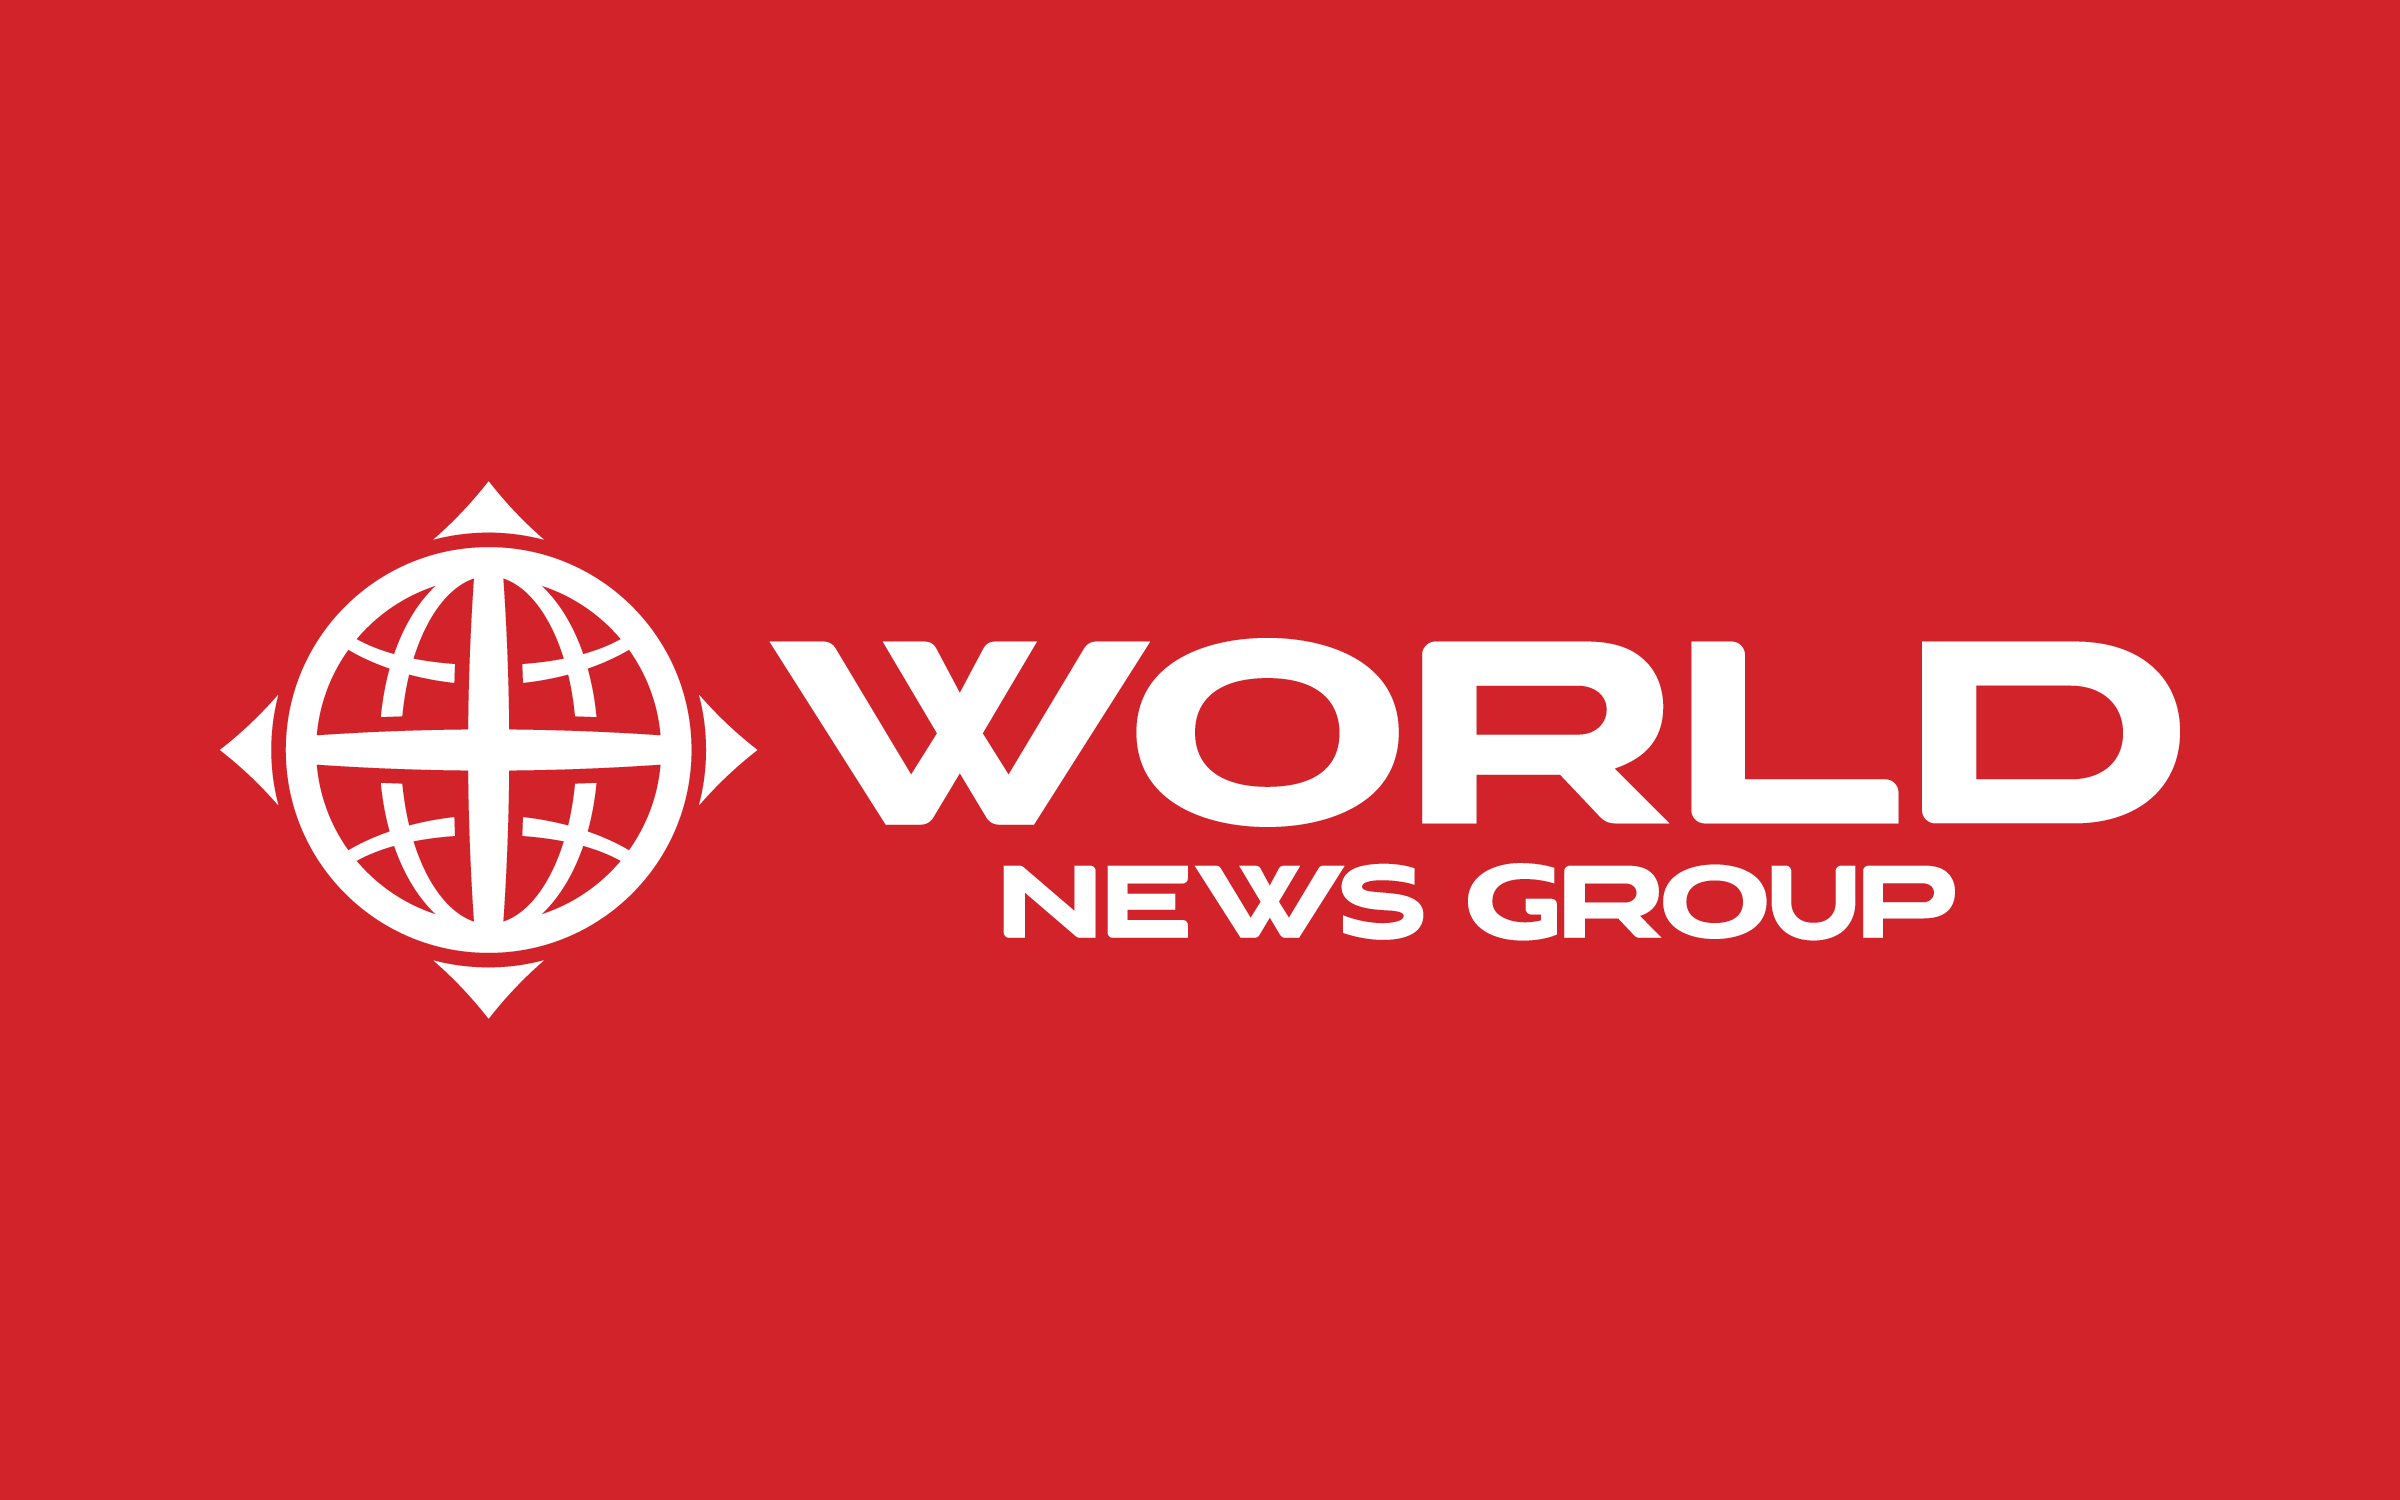 WORLD NEWS GROUP